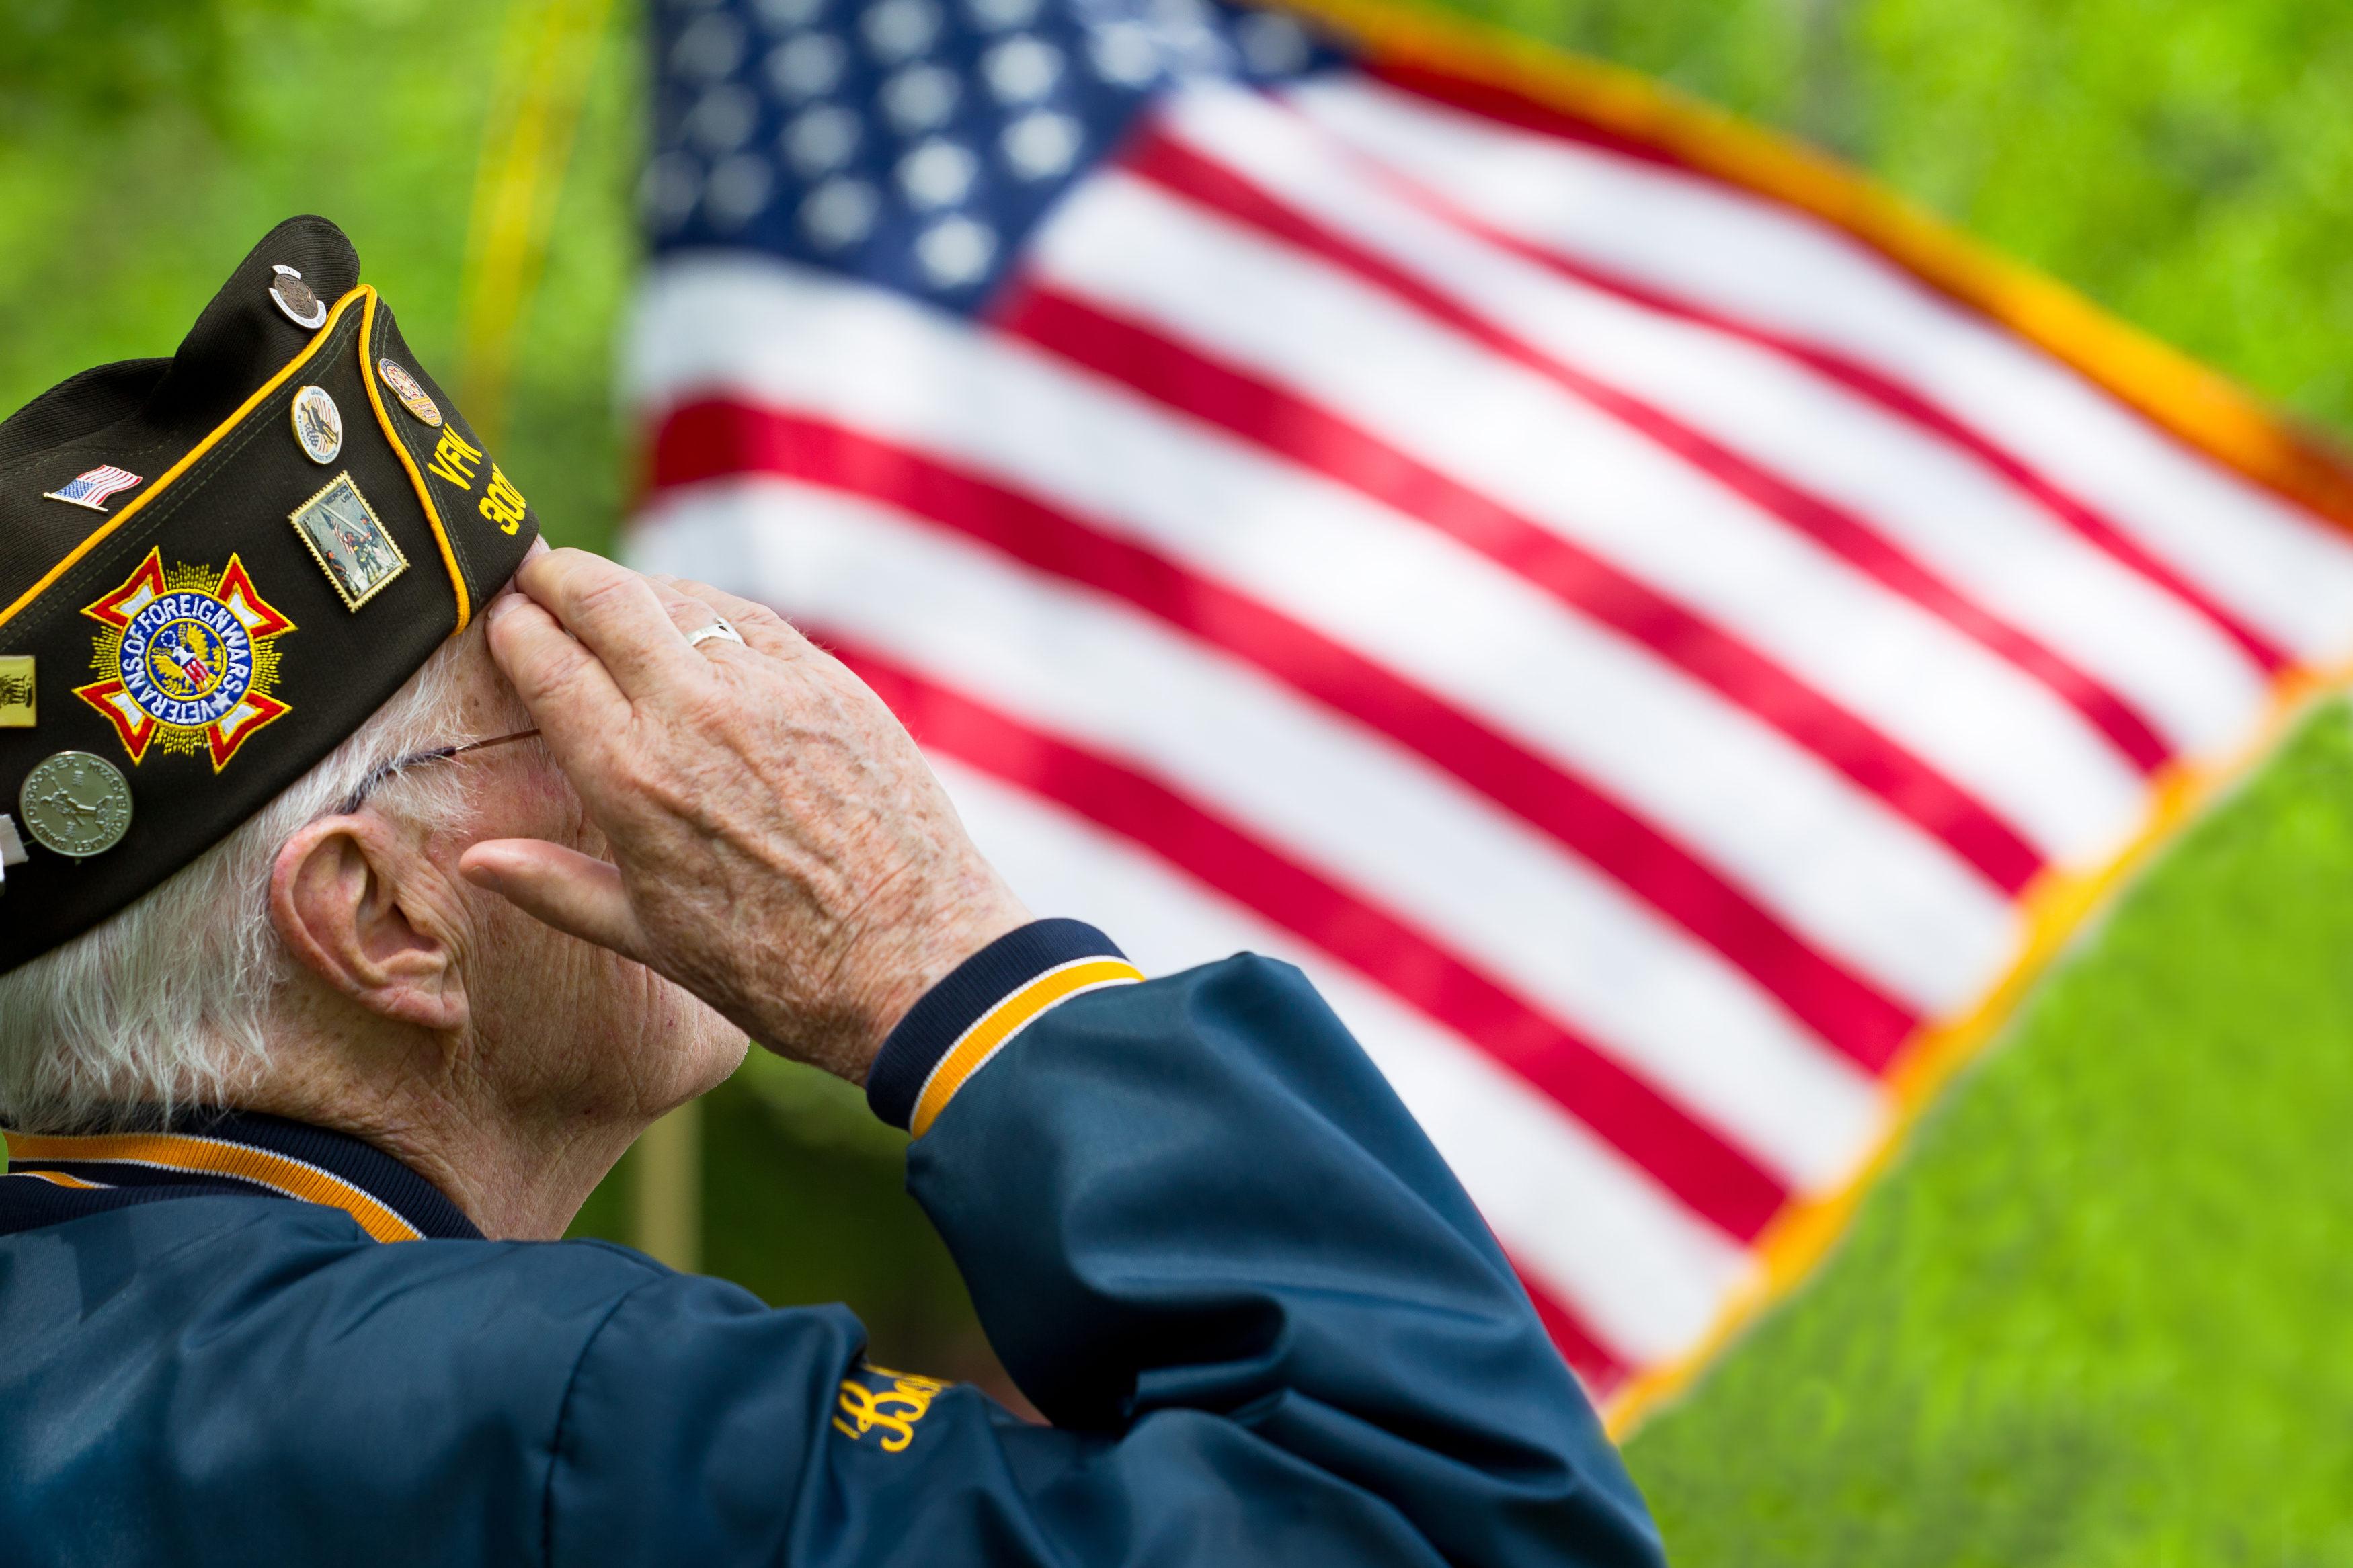 veterans-12.30-3500x2333.jpg